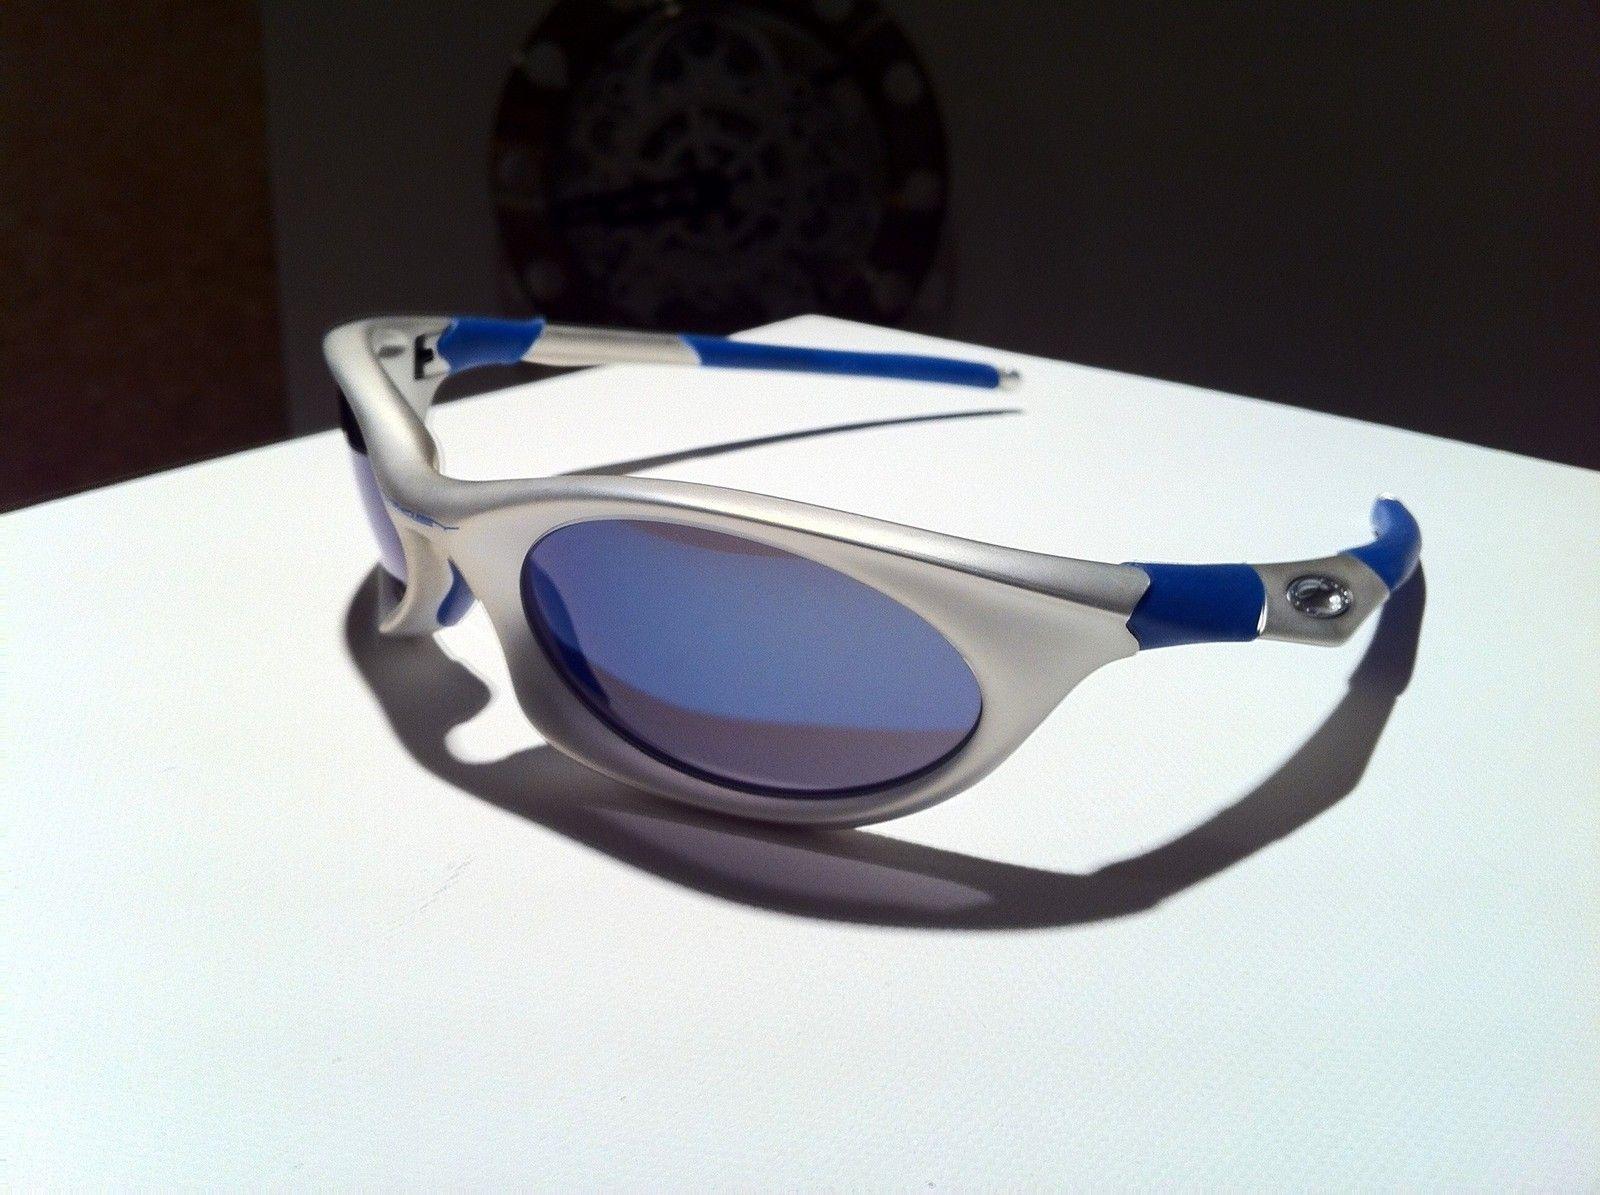 Eye Jacket 3.0 Fmj 5.56 W/ Ice Iridium - fDJaf.jpg